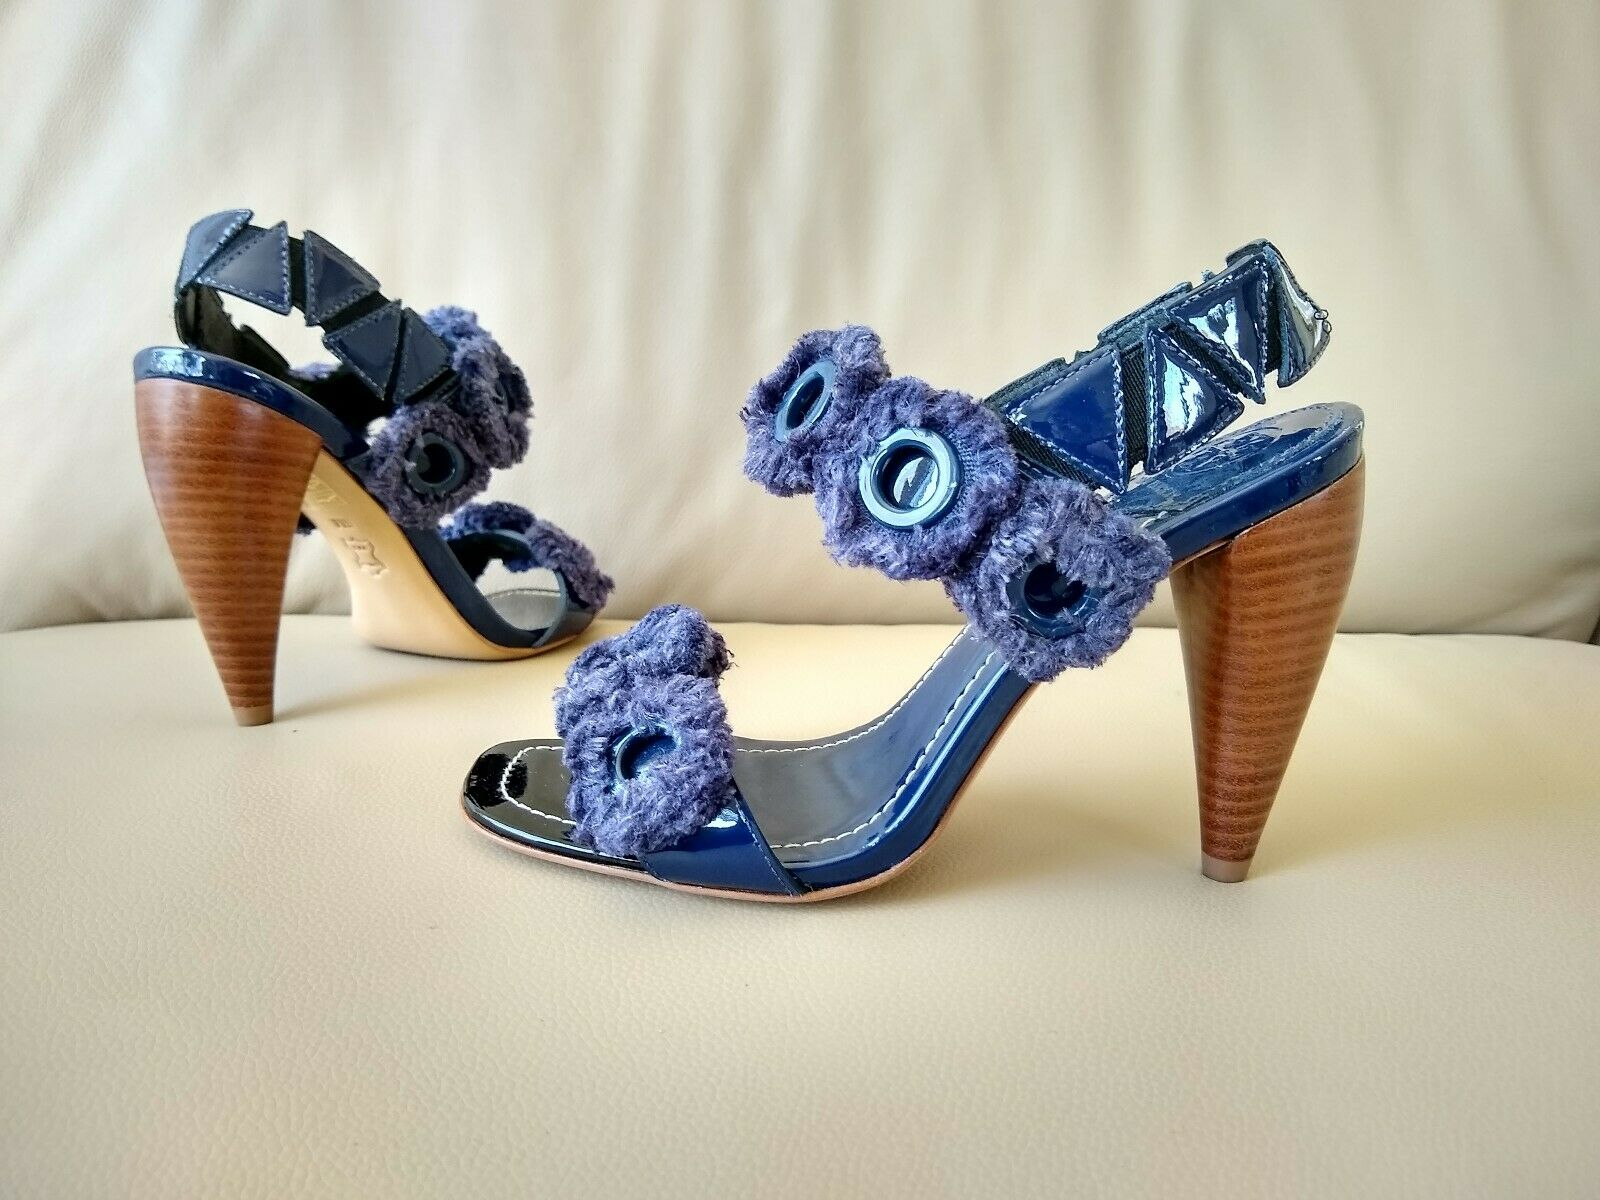 375 Tory Burch Freya Eyelet Slingback Patent Leather bluee Sandal Sz 6